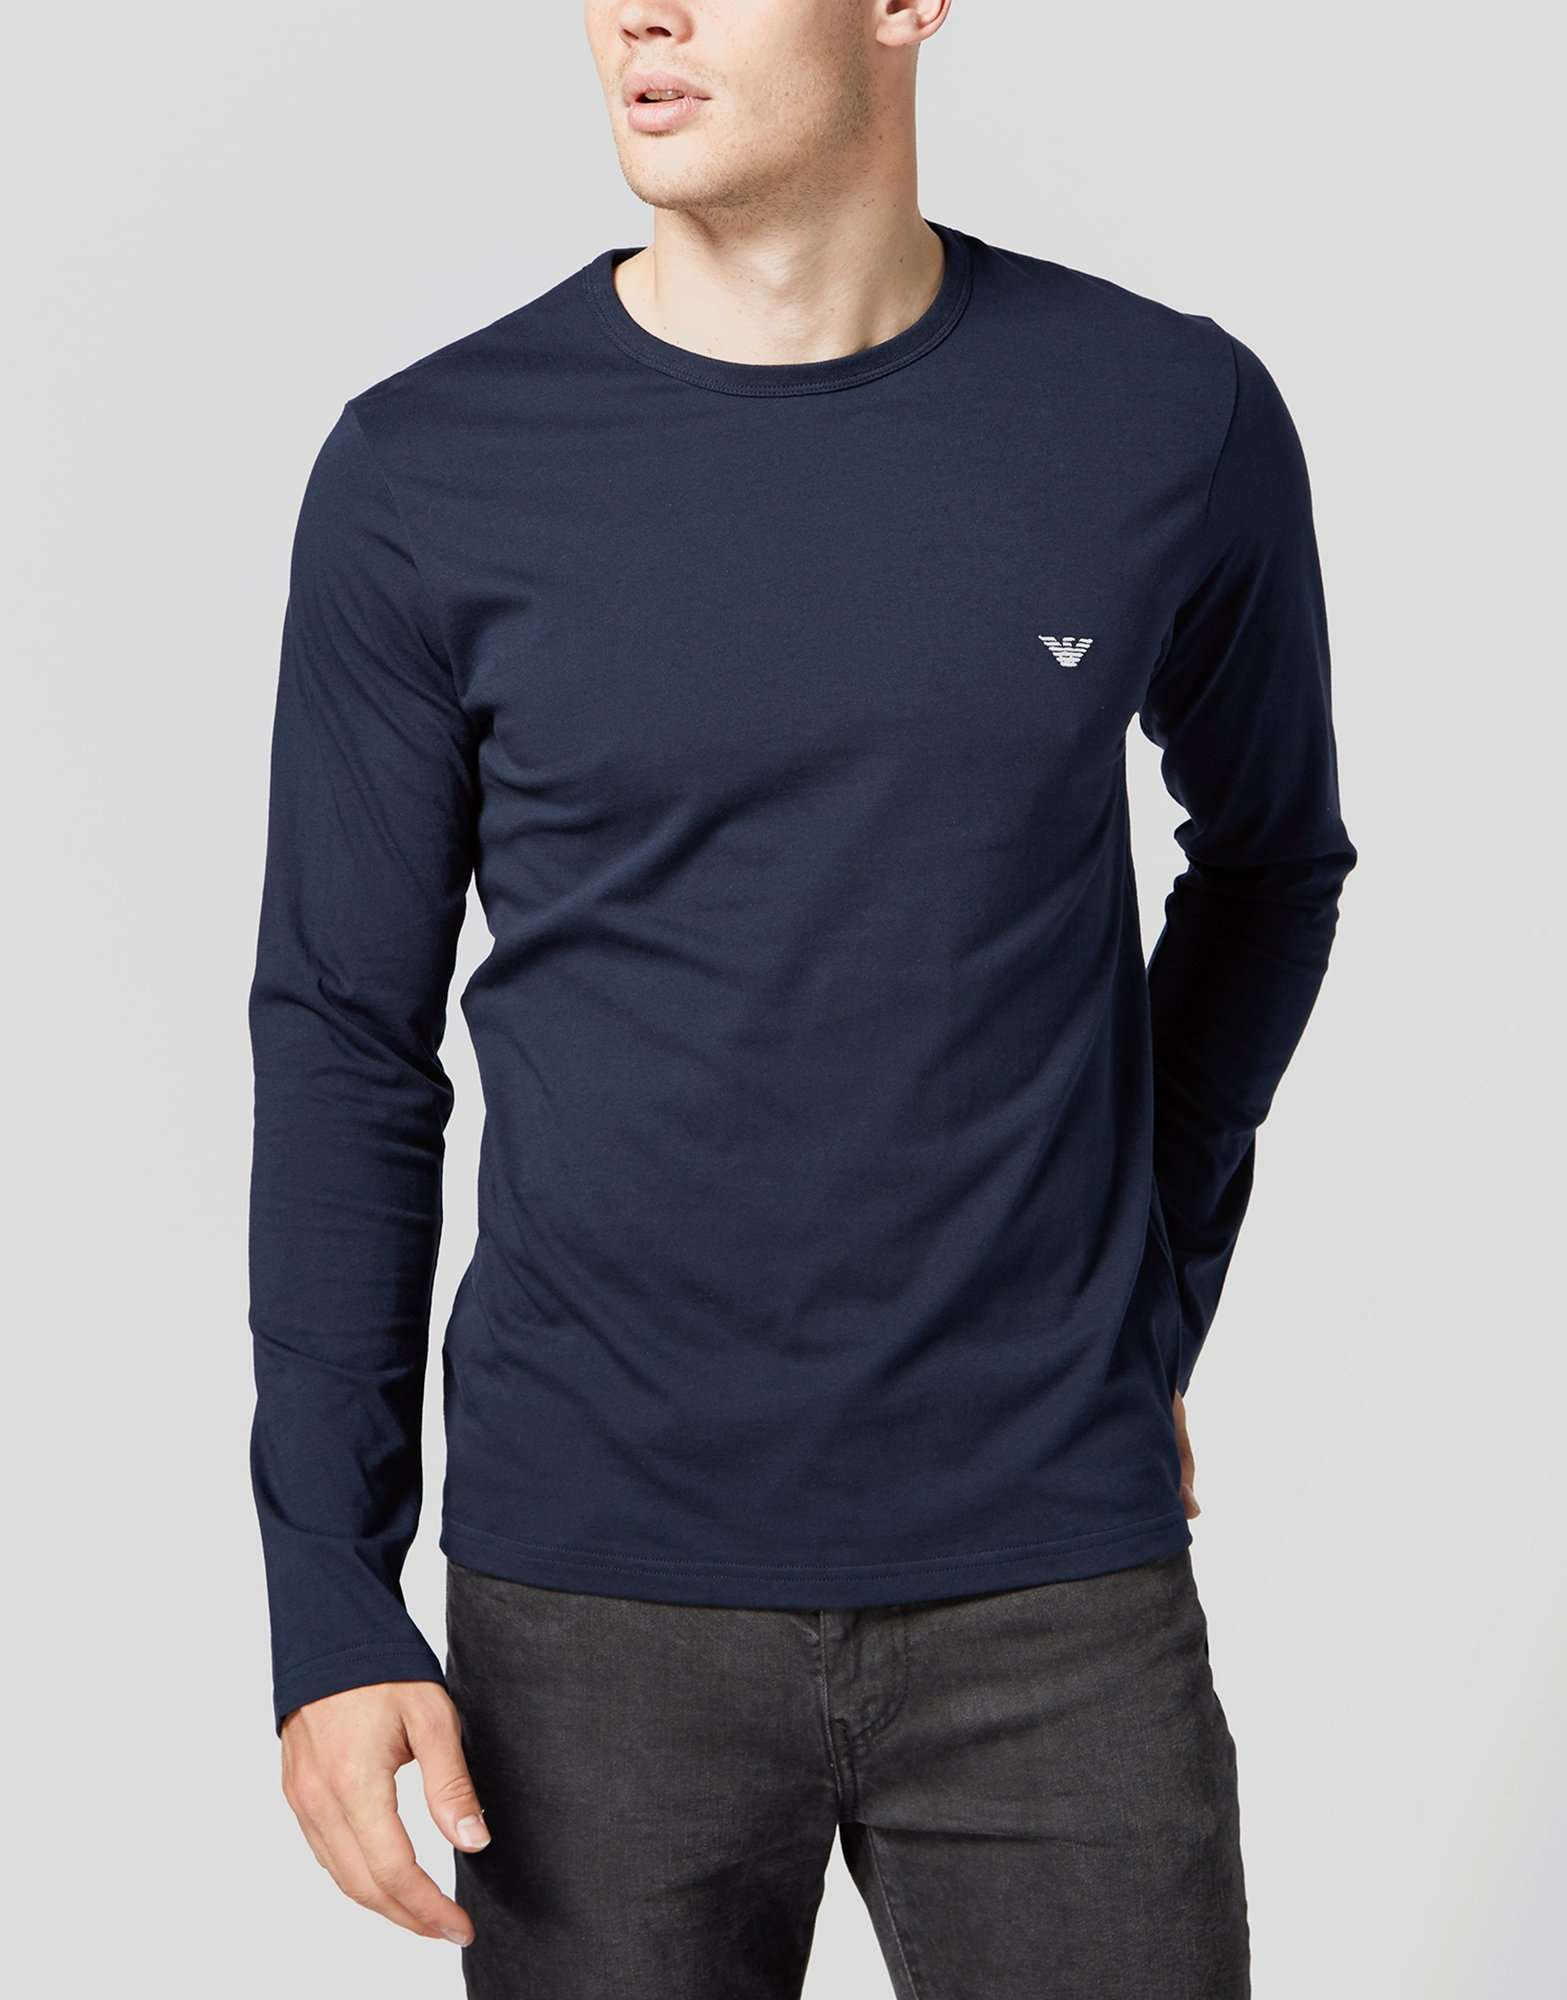 Shirt Crew Armani Neck Scotts Menswear Sleeved Emporio T Long xwFYZTZqa